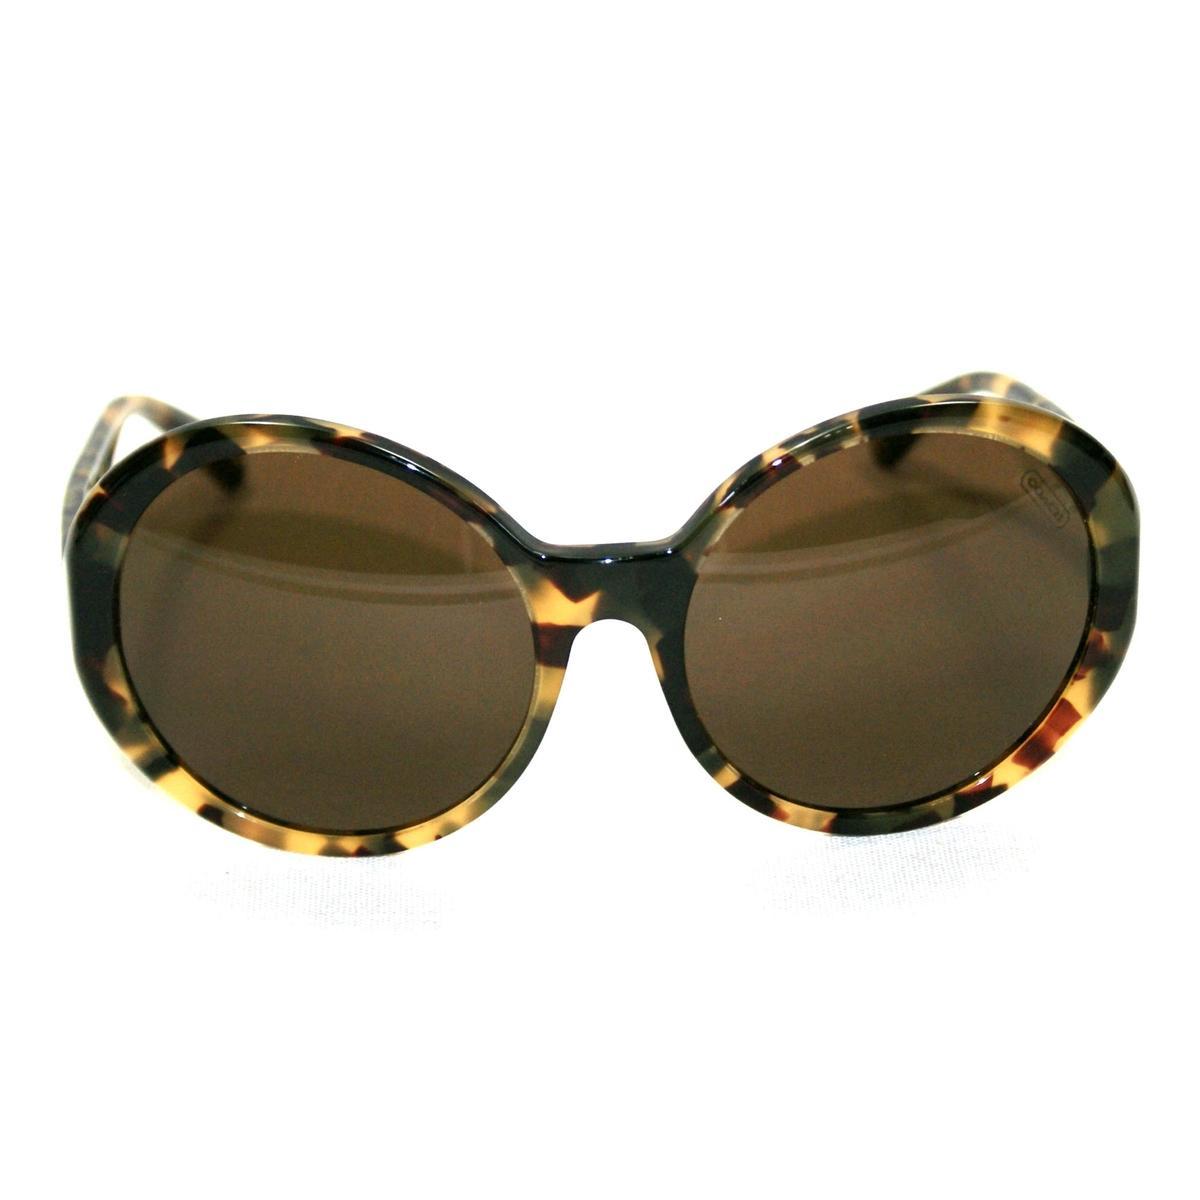 c57740ea64 Snap Popular items for tortoise glasses on Etsy photos on Pinterest